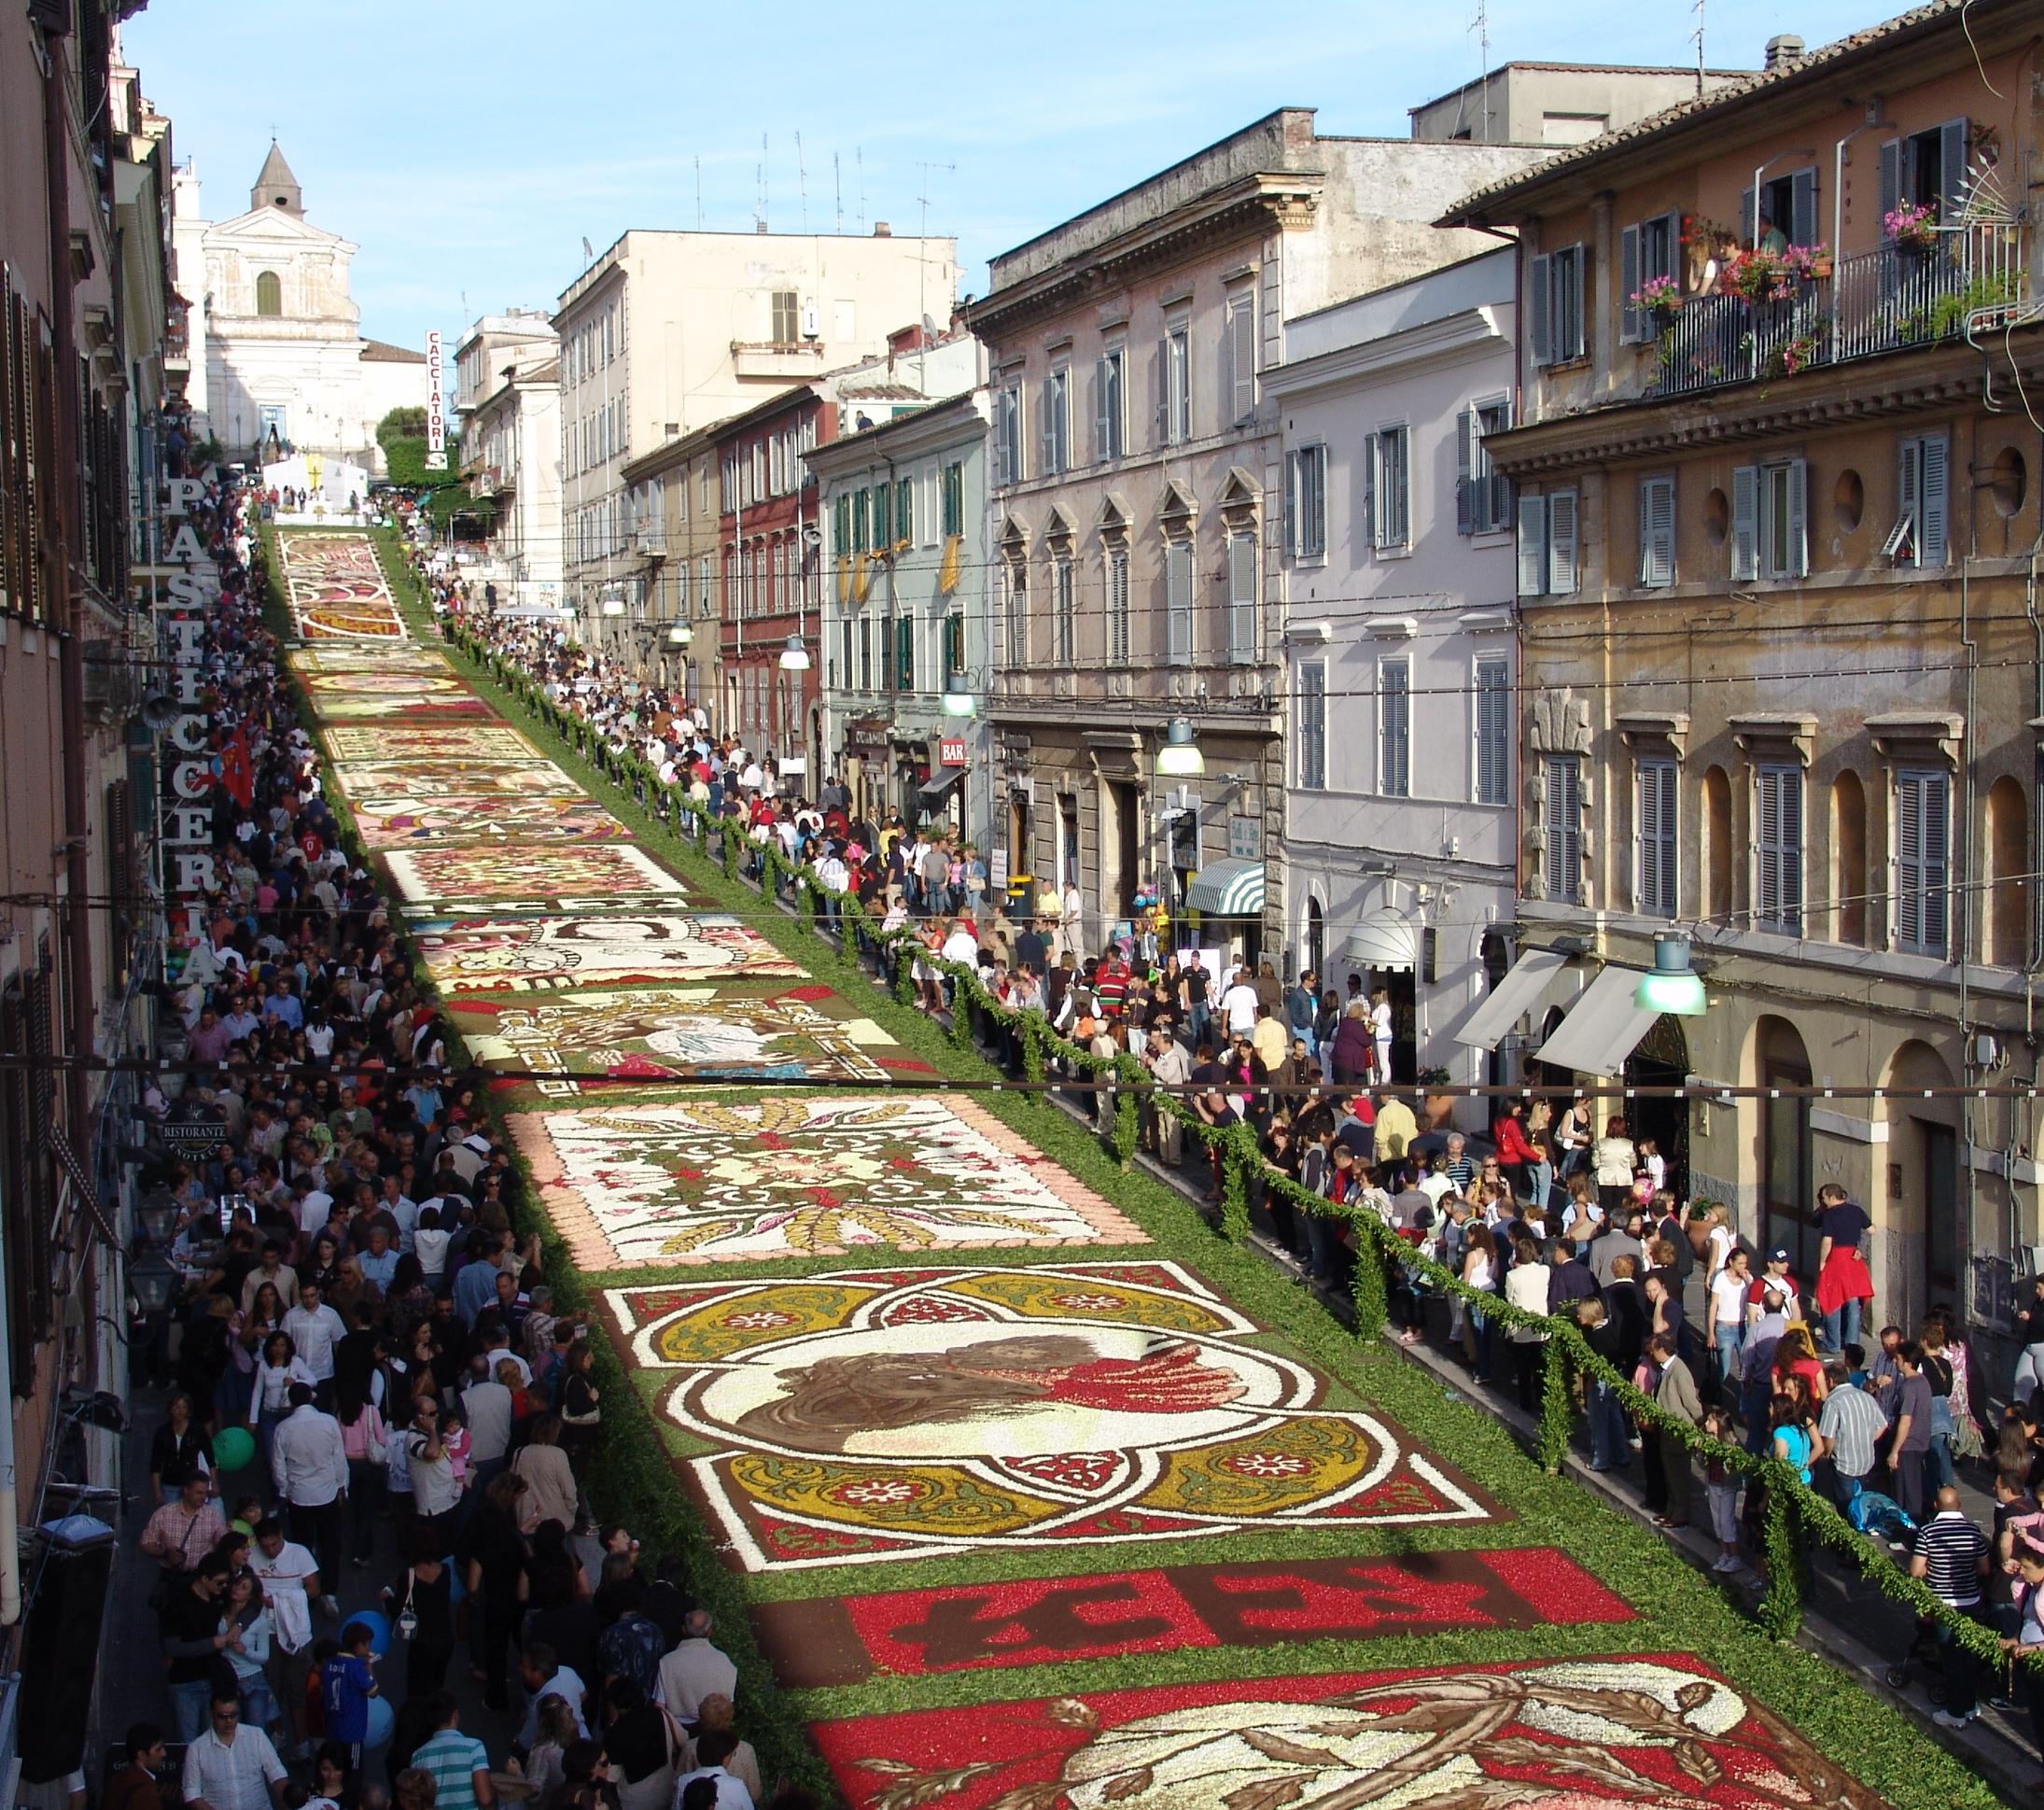 Spectaculaire : l'Infiorata di Genzano di Roma